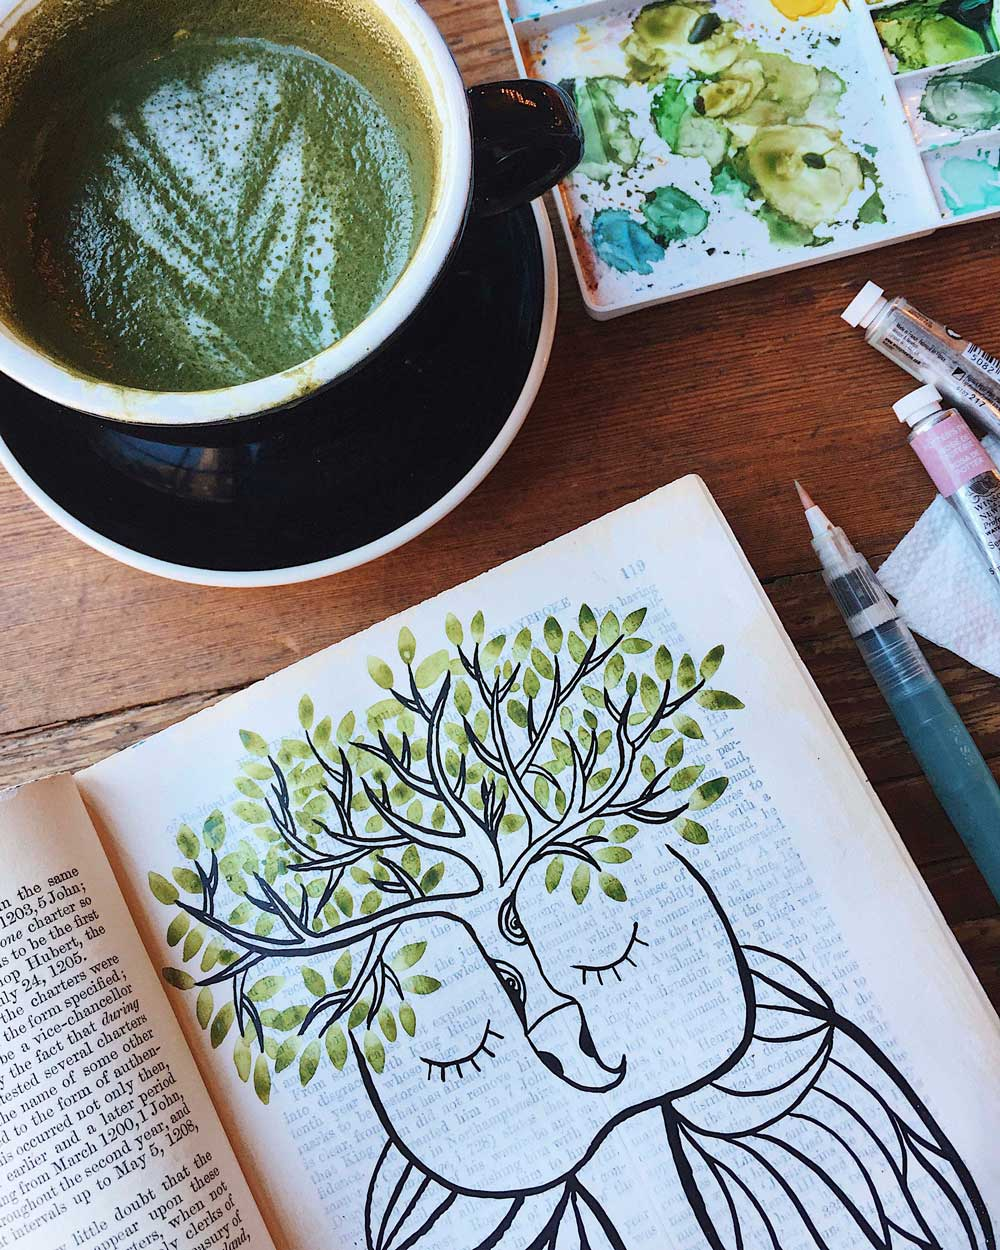 spring-bloom-book-page-paitning-eve-devore-59.jpg